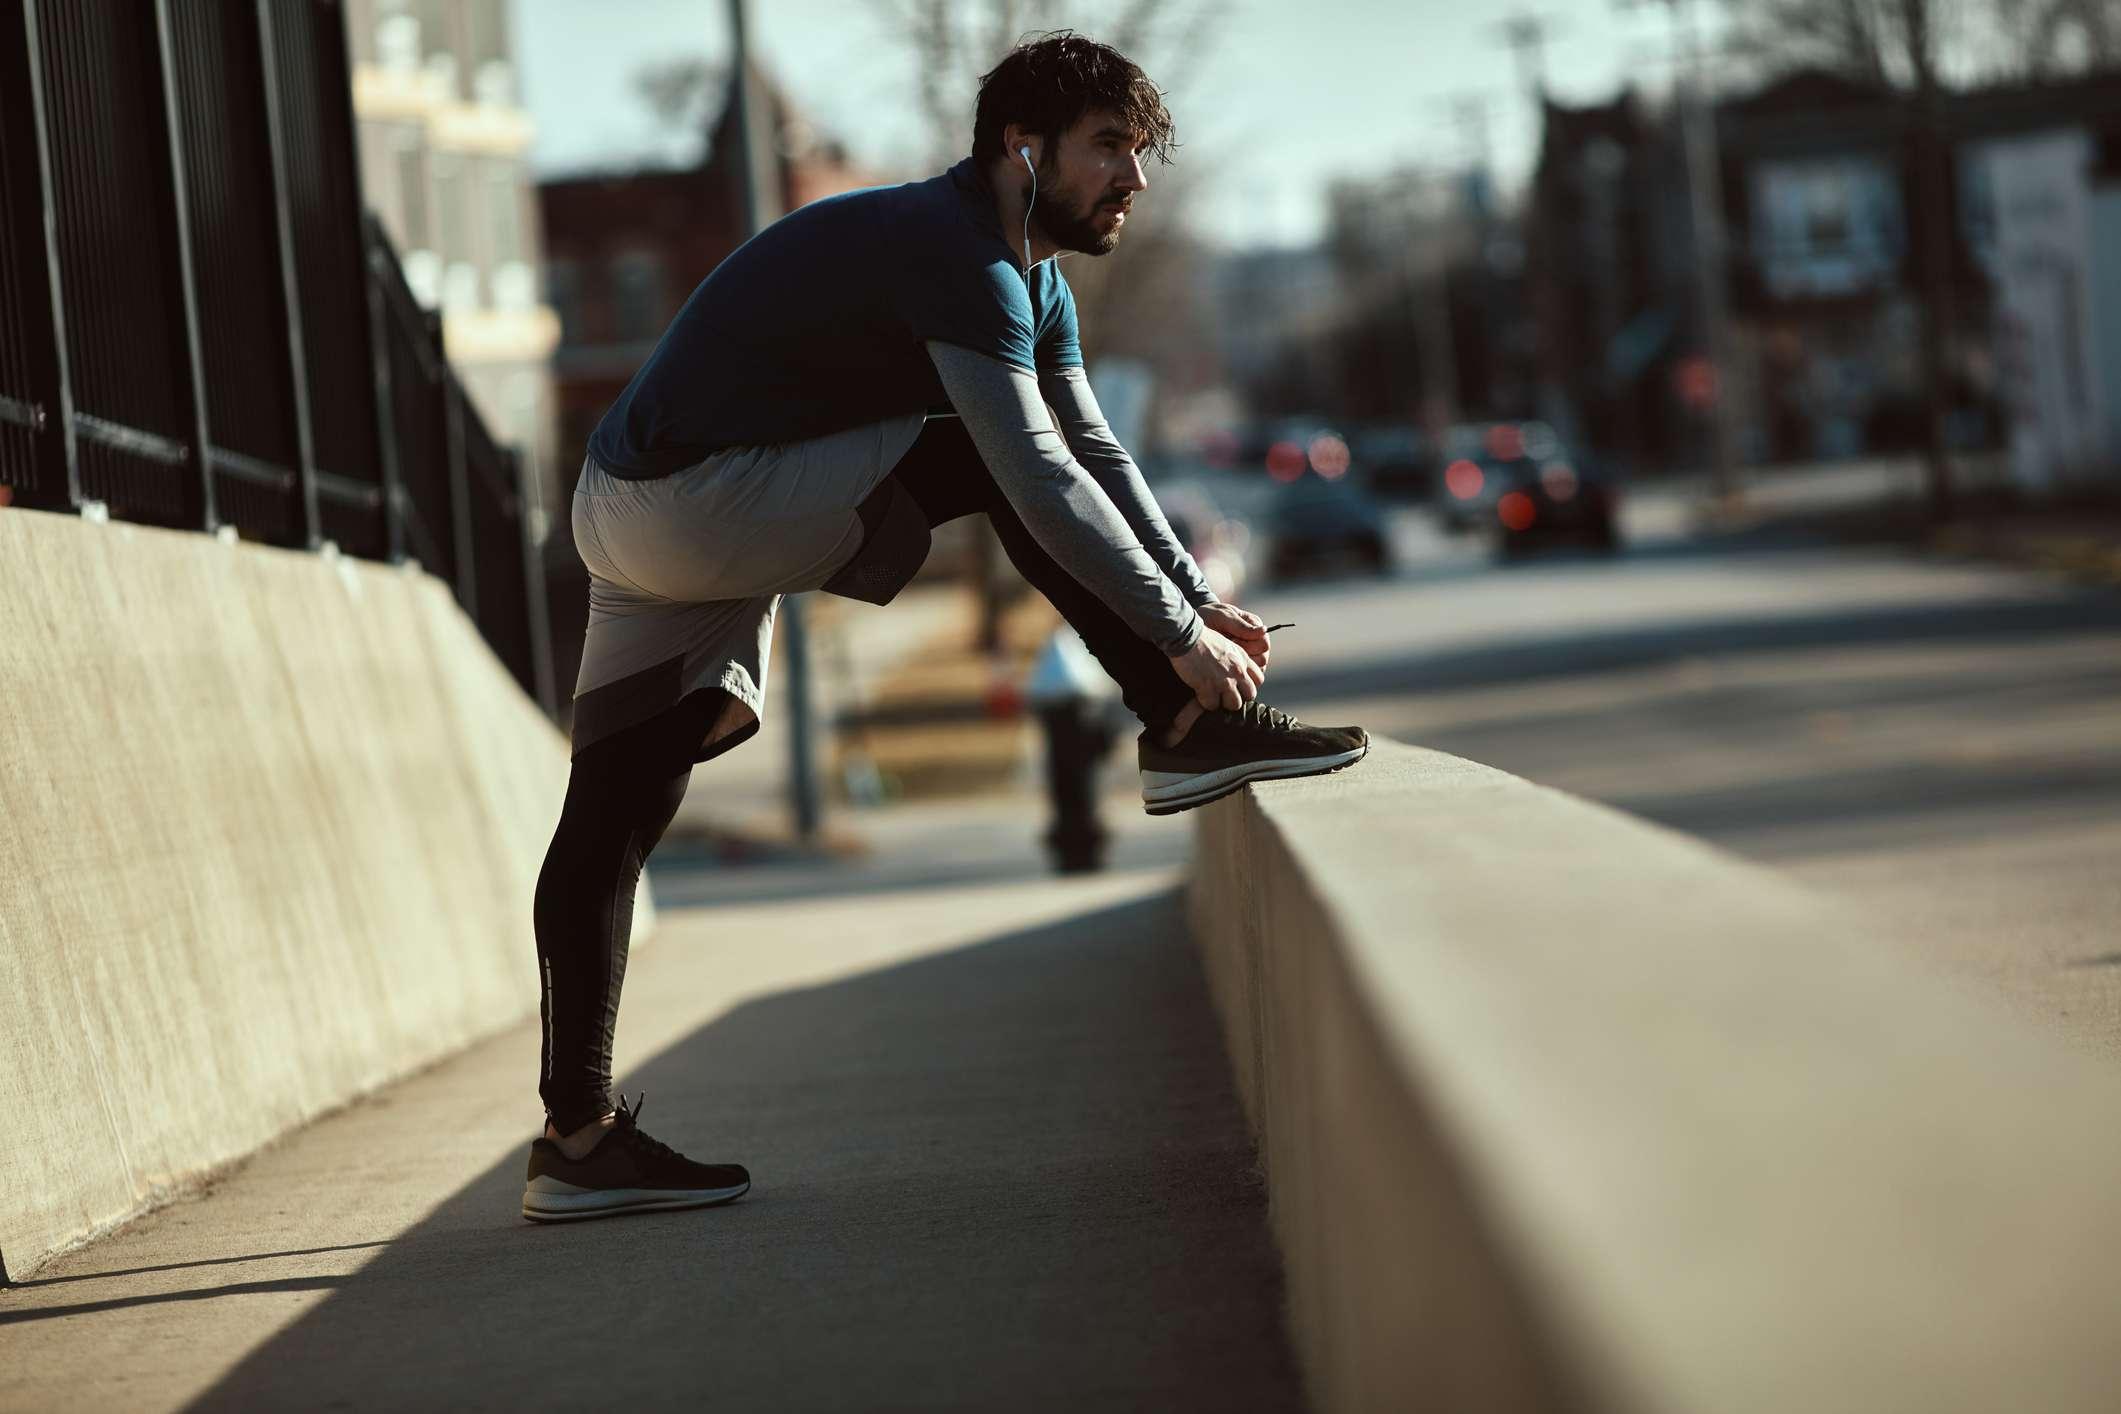 Man stretching on street